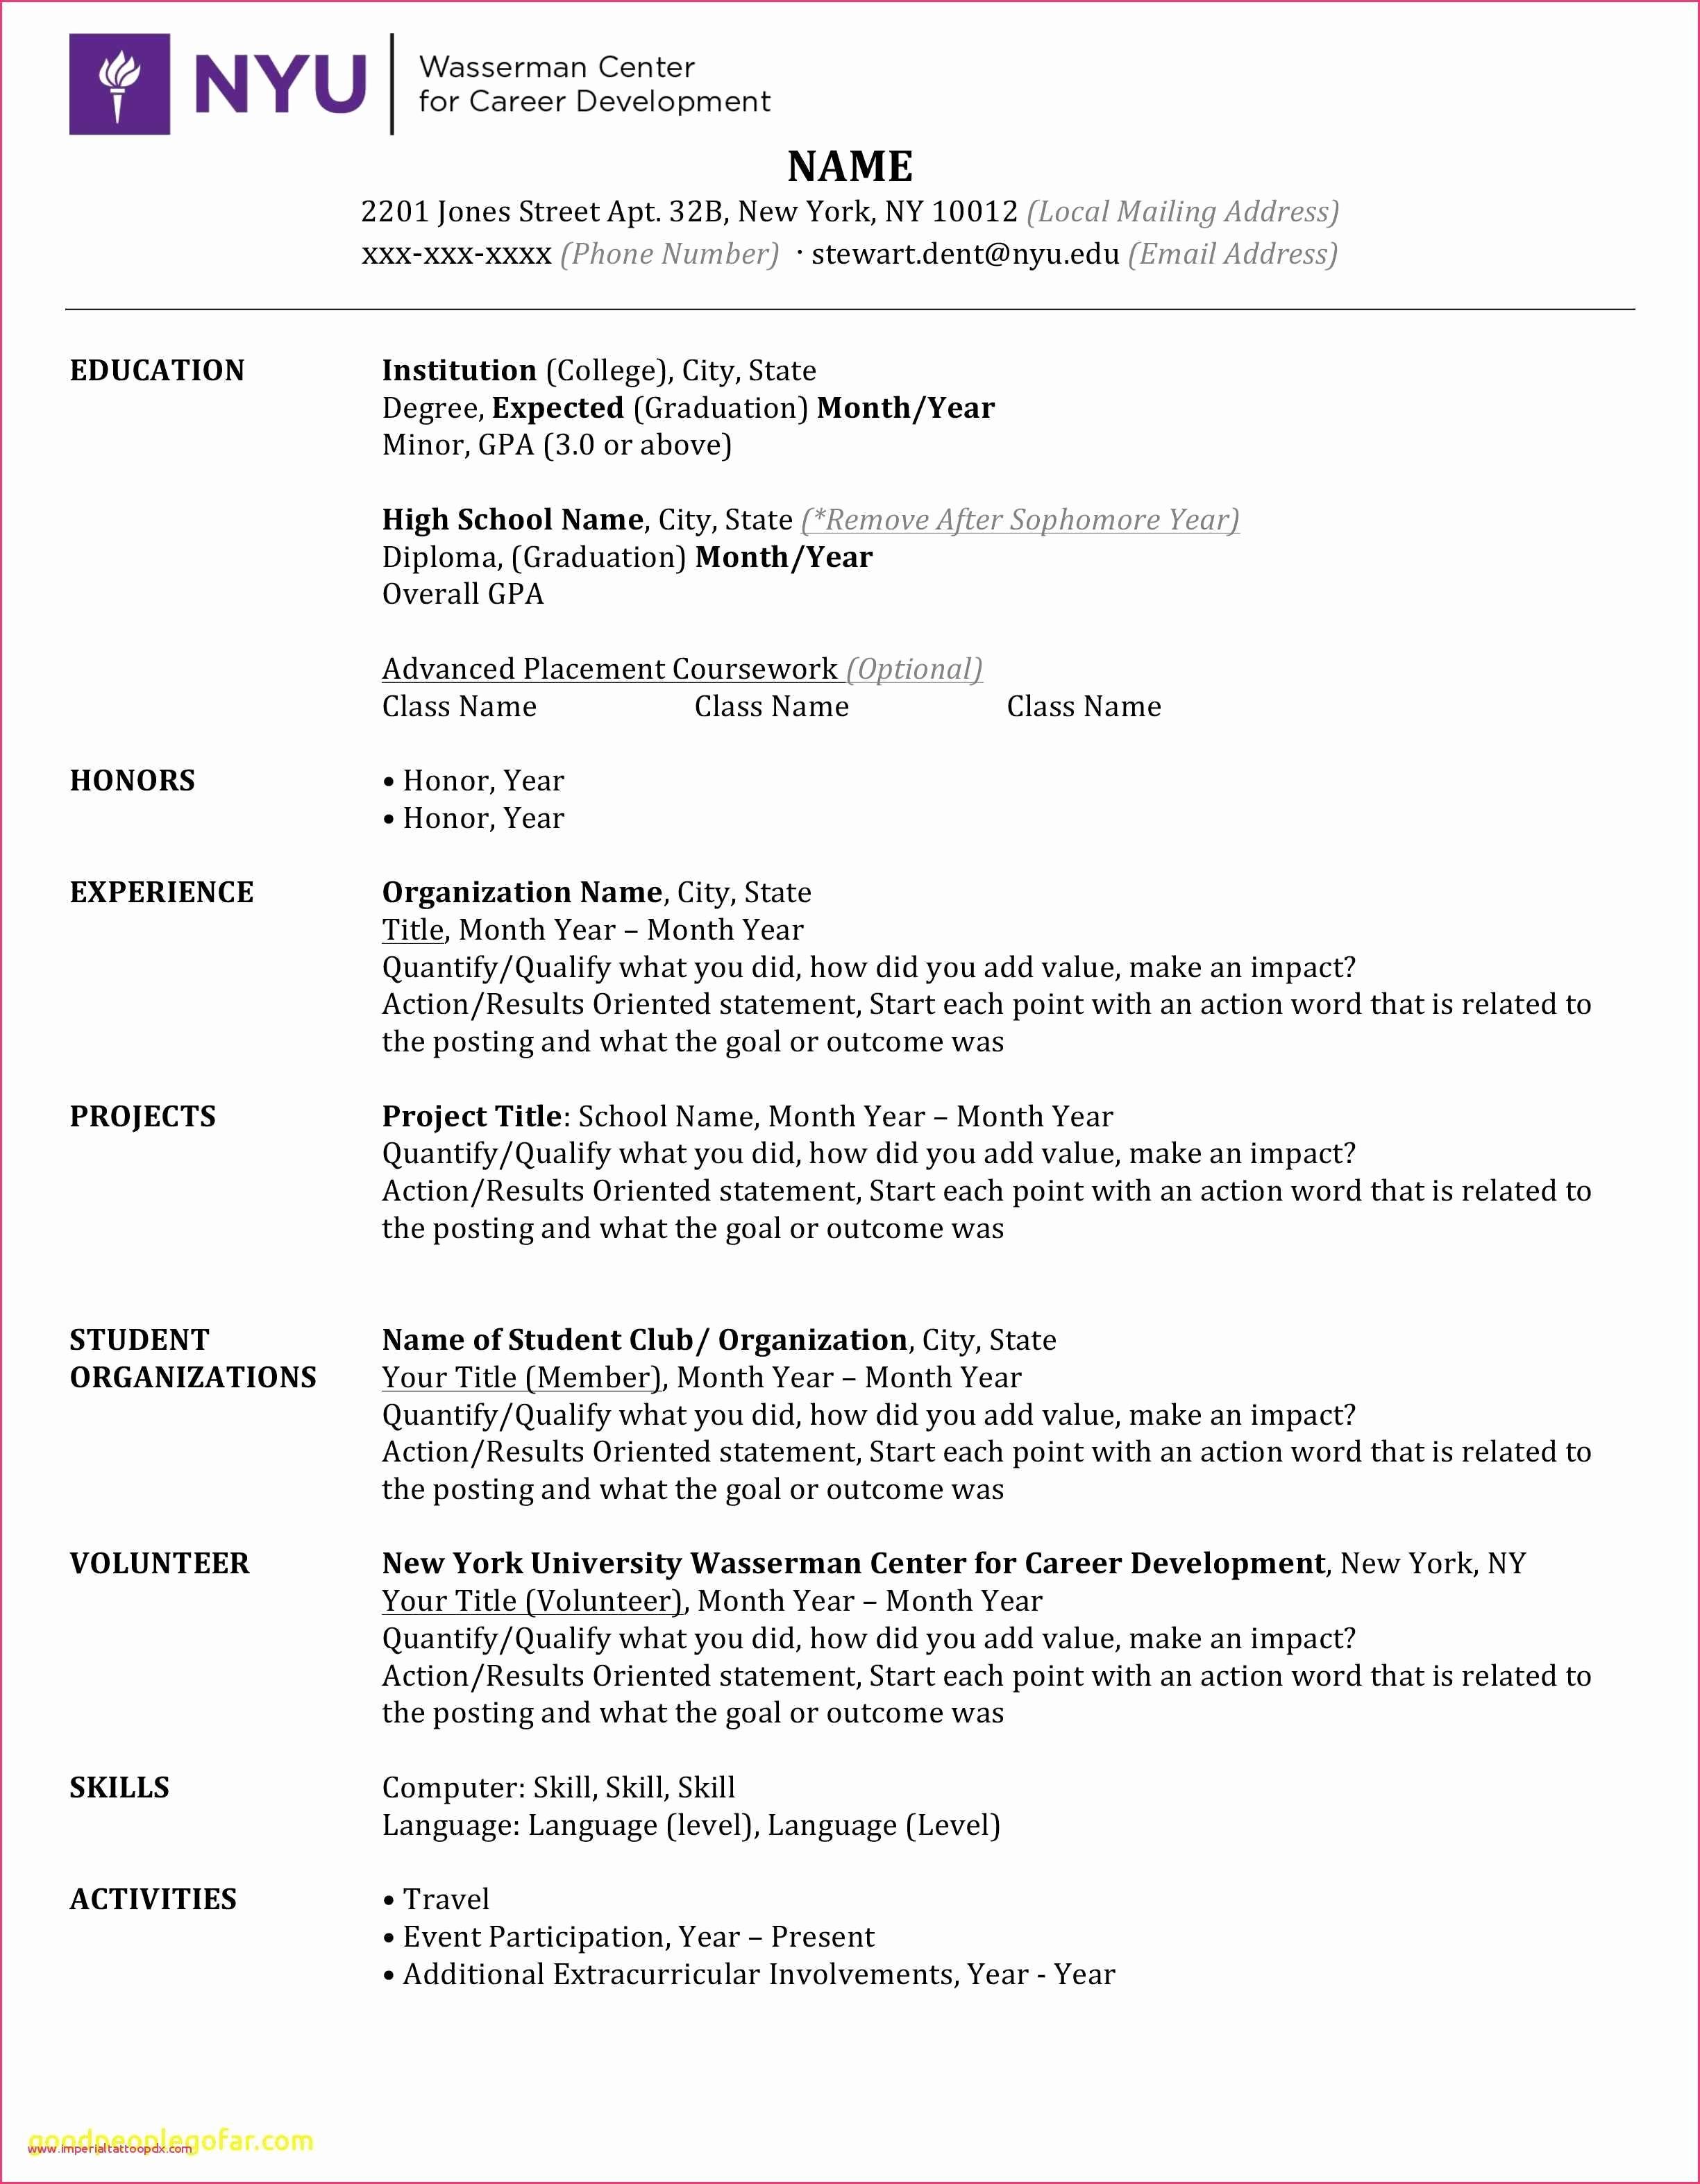 Resume Template Microsoft Word 2007 Beautiful 46 Resume Template Download for Microsoft Word 2007